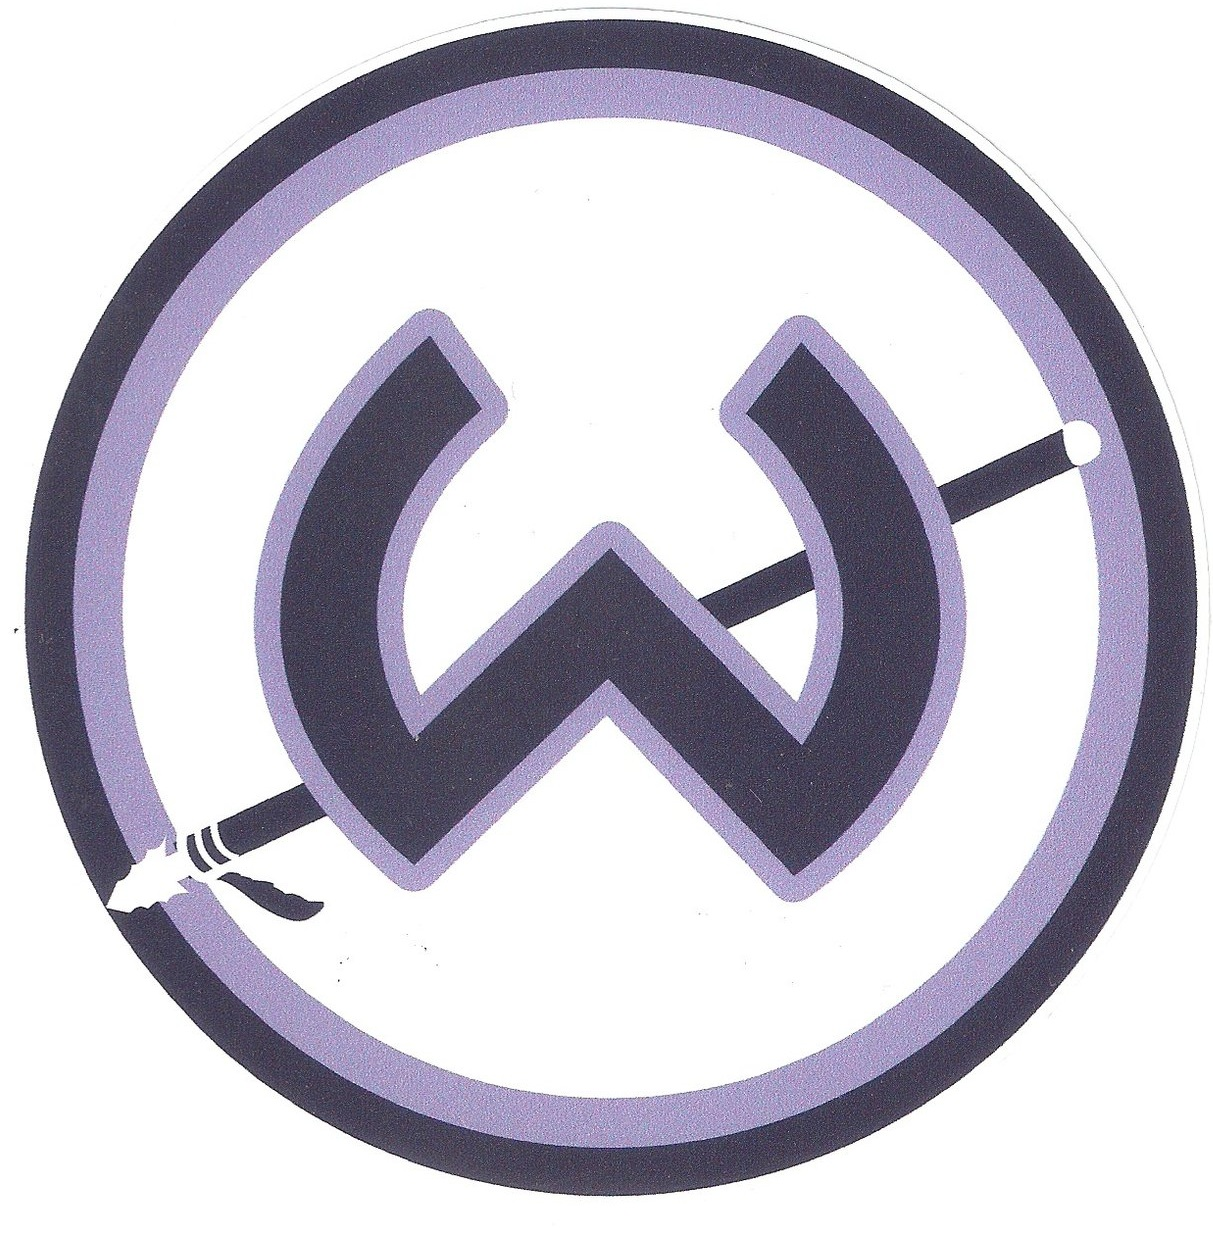 W+and+Spear+sticker.jpg